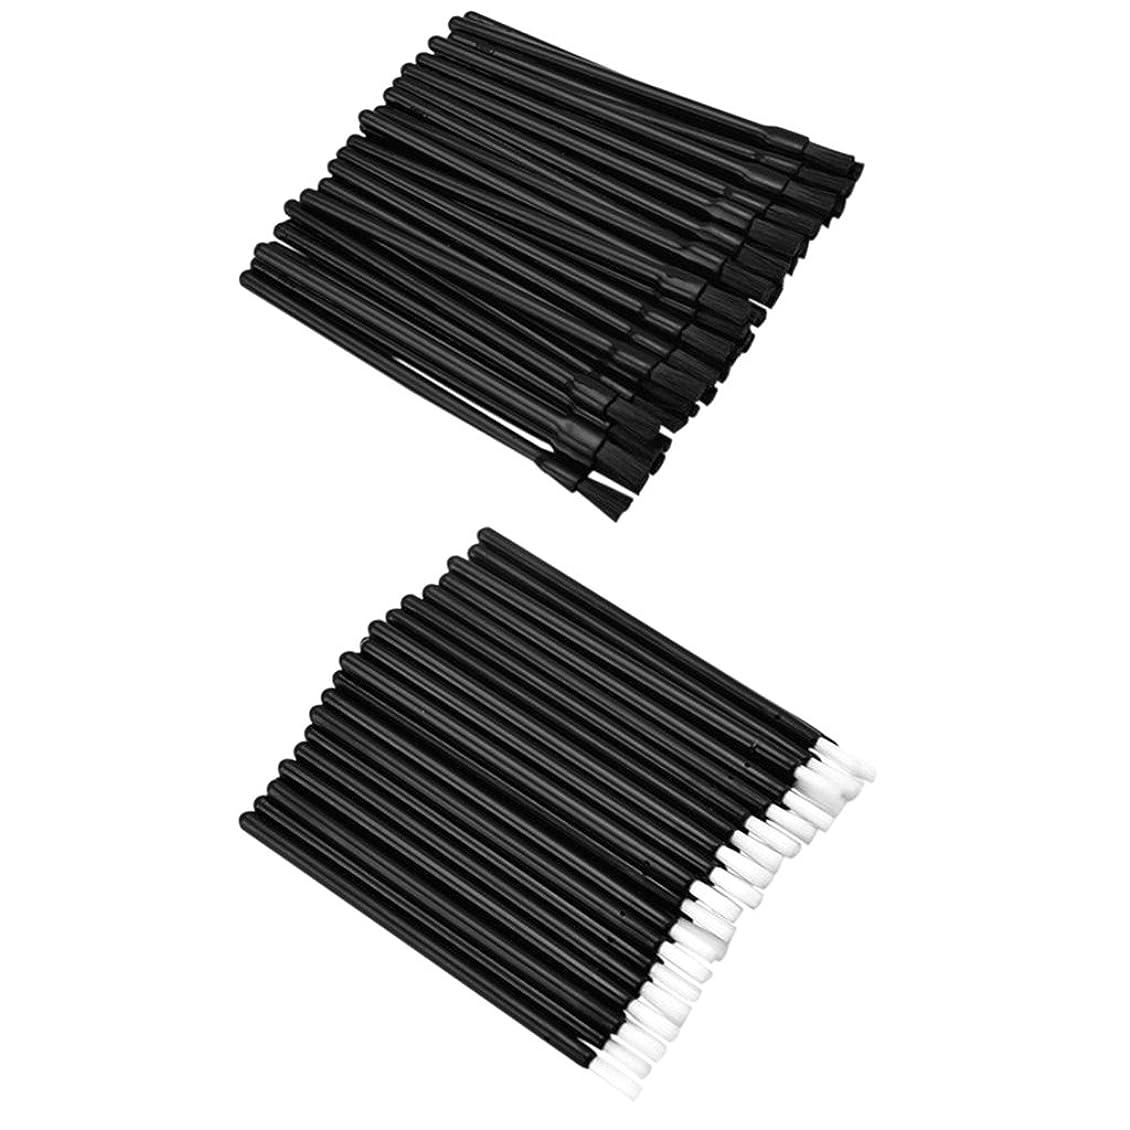 DYNWAVE リップブラシ ロット リップ ブラシ 使い捨て 繊維 リップ メイクブラシ 約100個